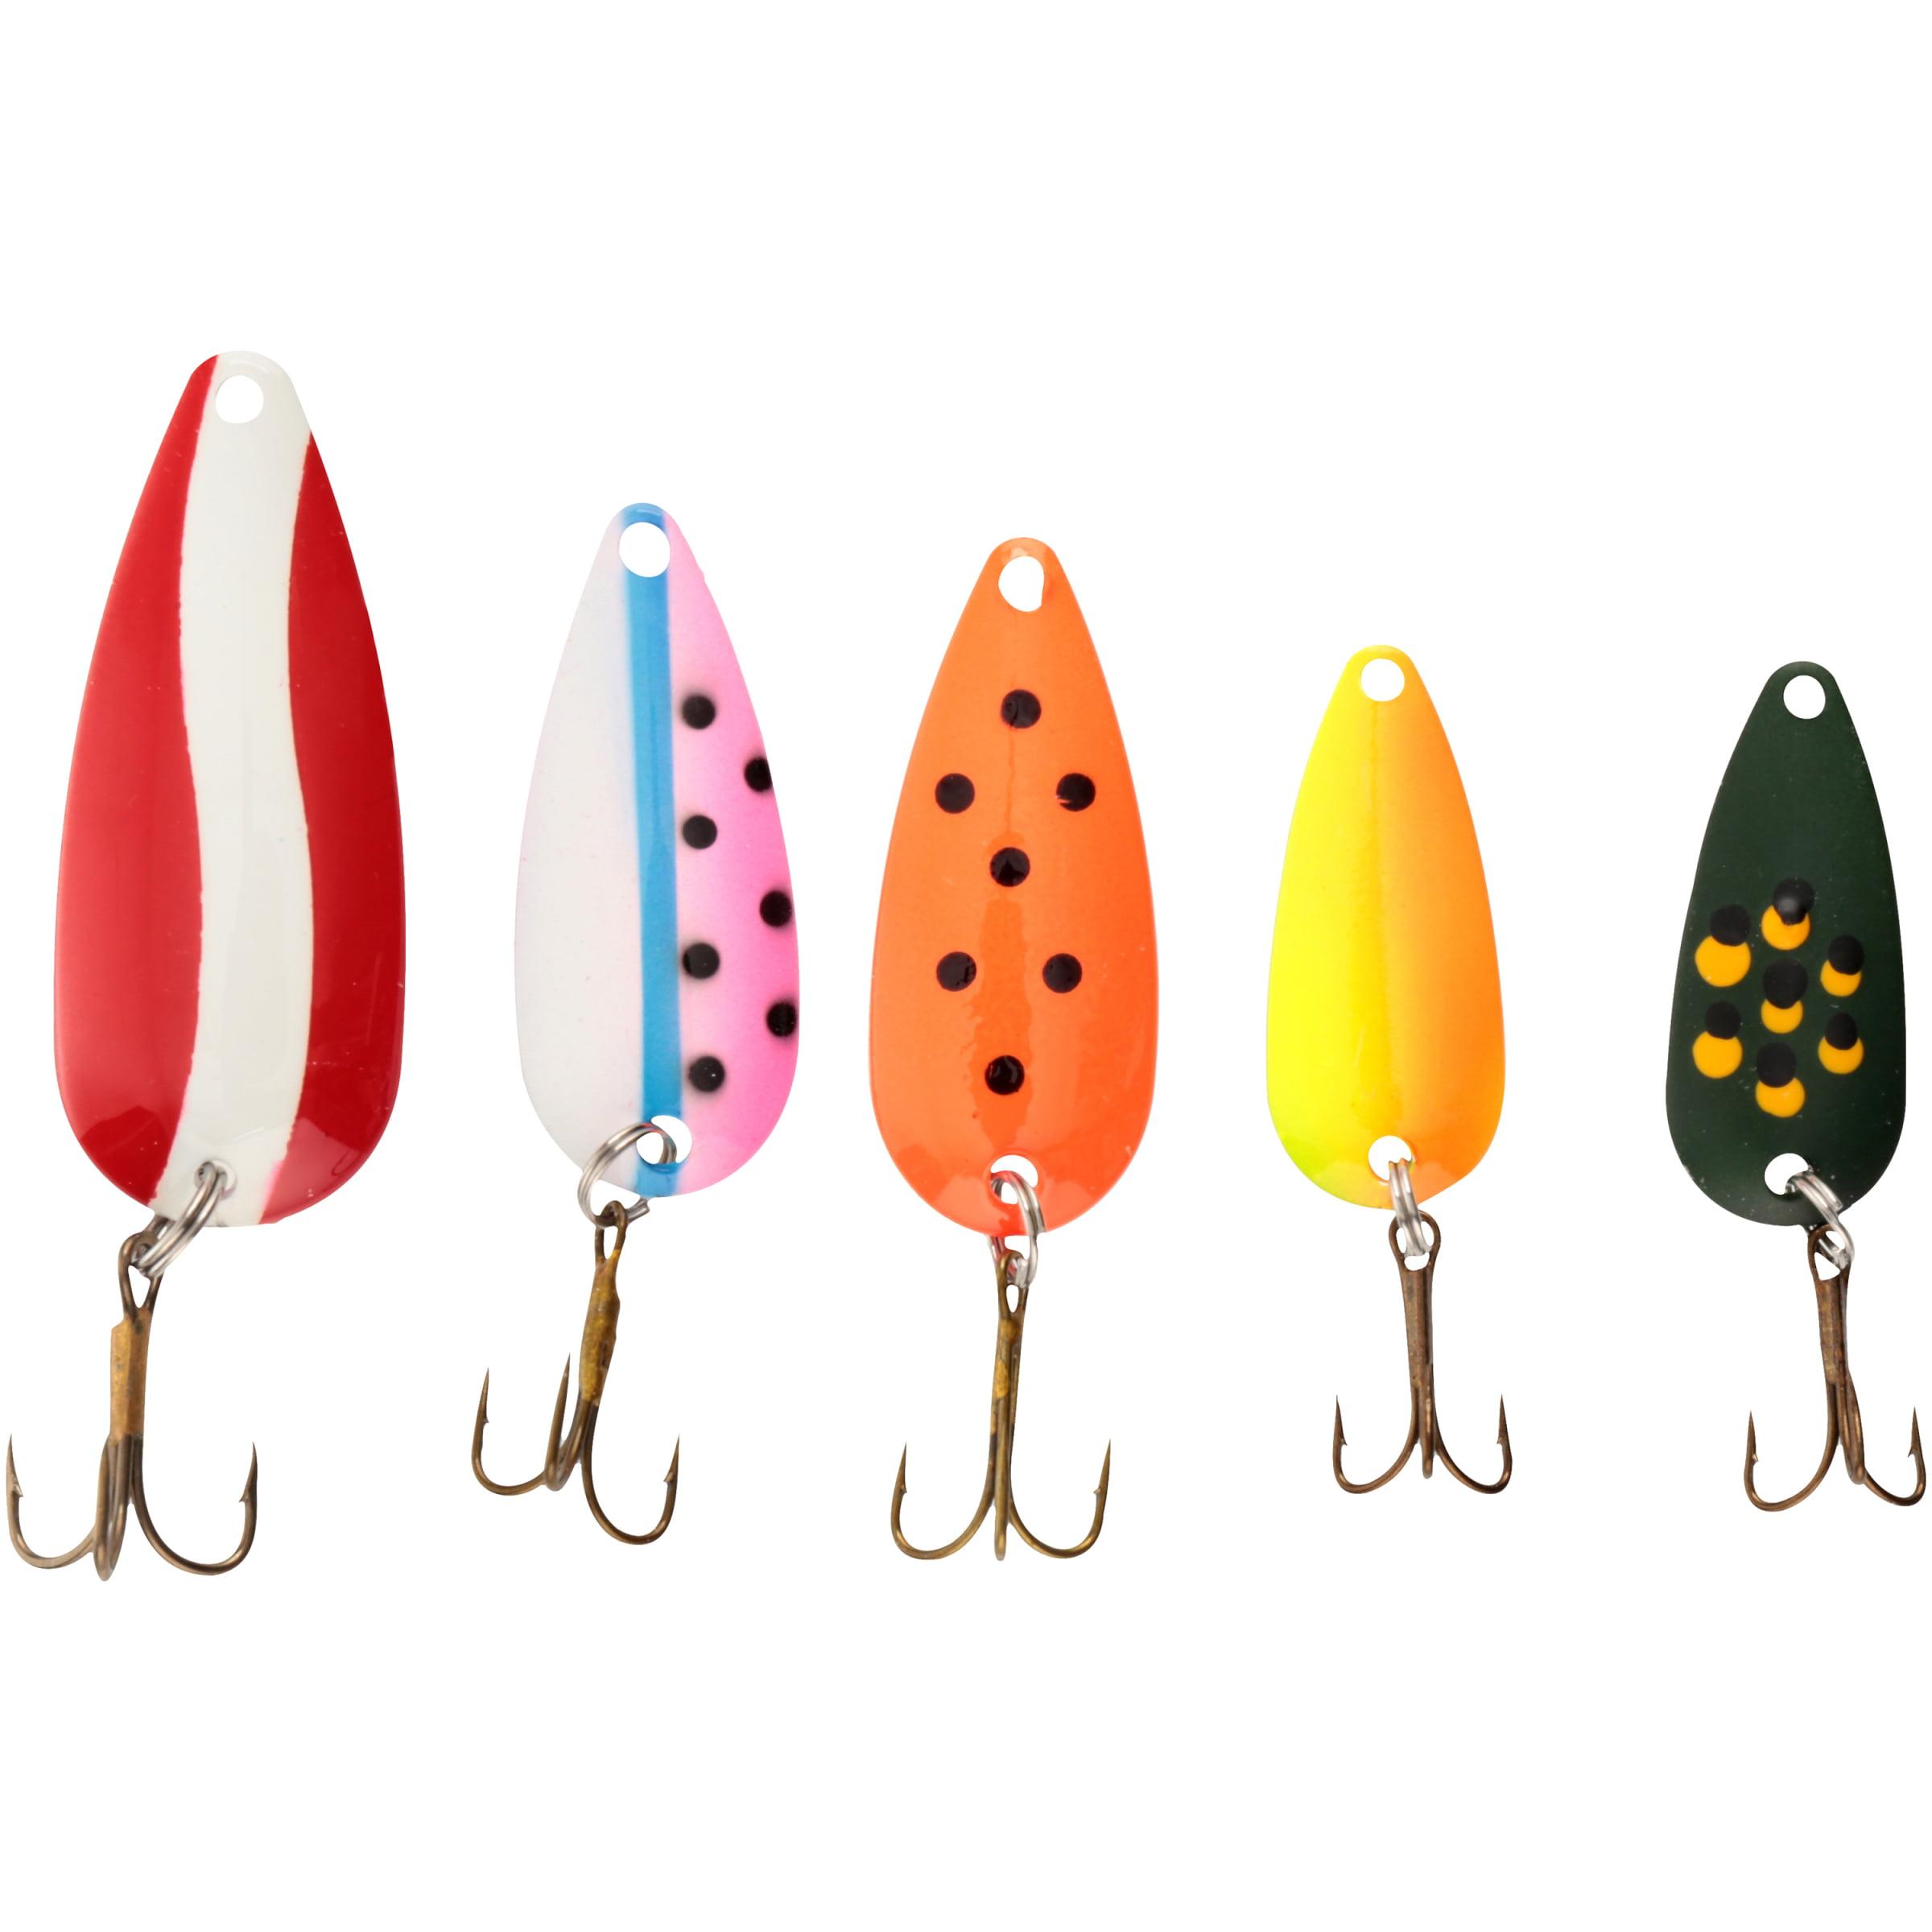 Danielson demon spoons fishing hooks 5 pc